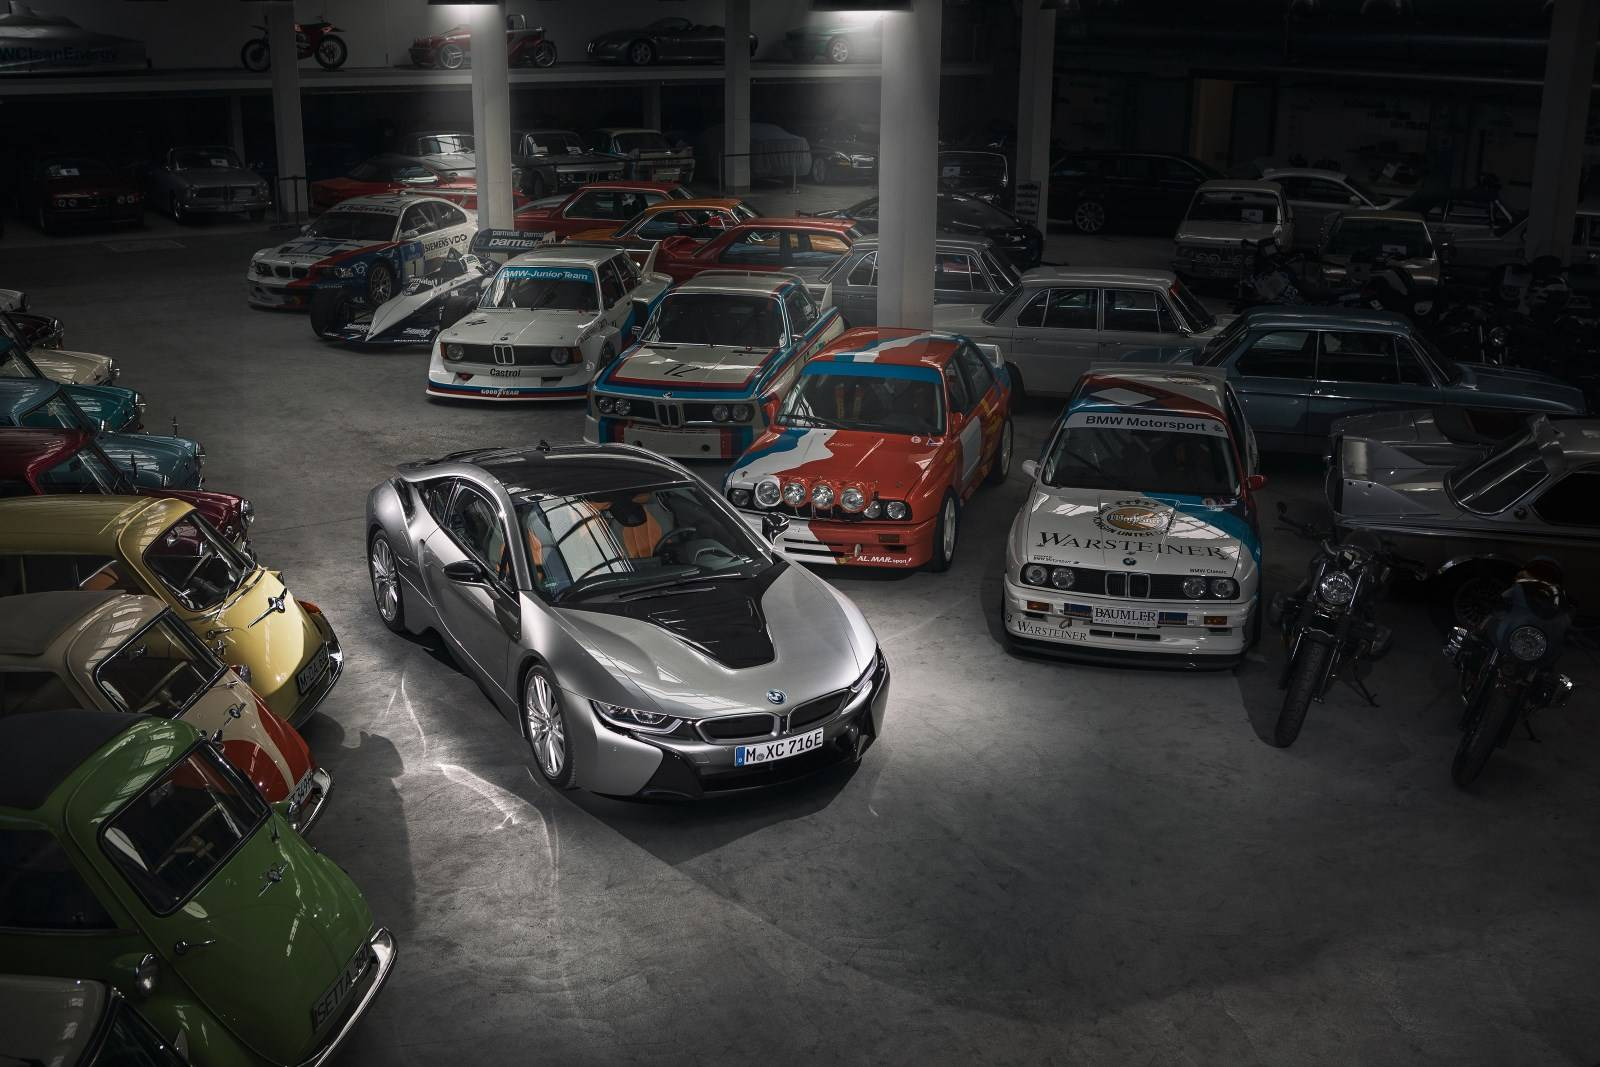 BMW i8 уходит в музей - BMW Group прекращает производство гибрида 4